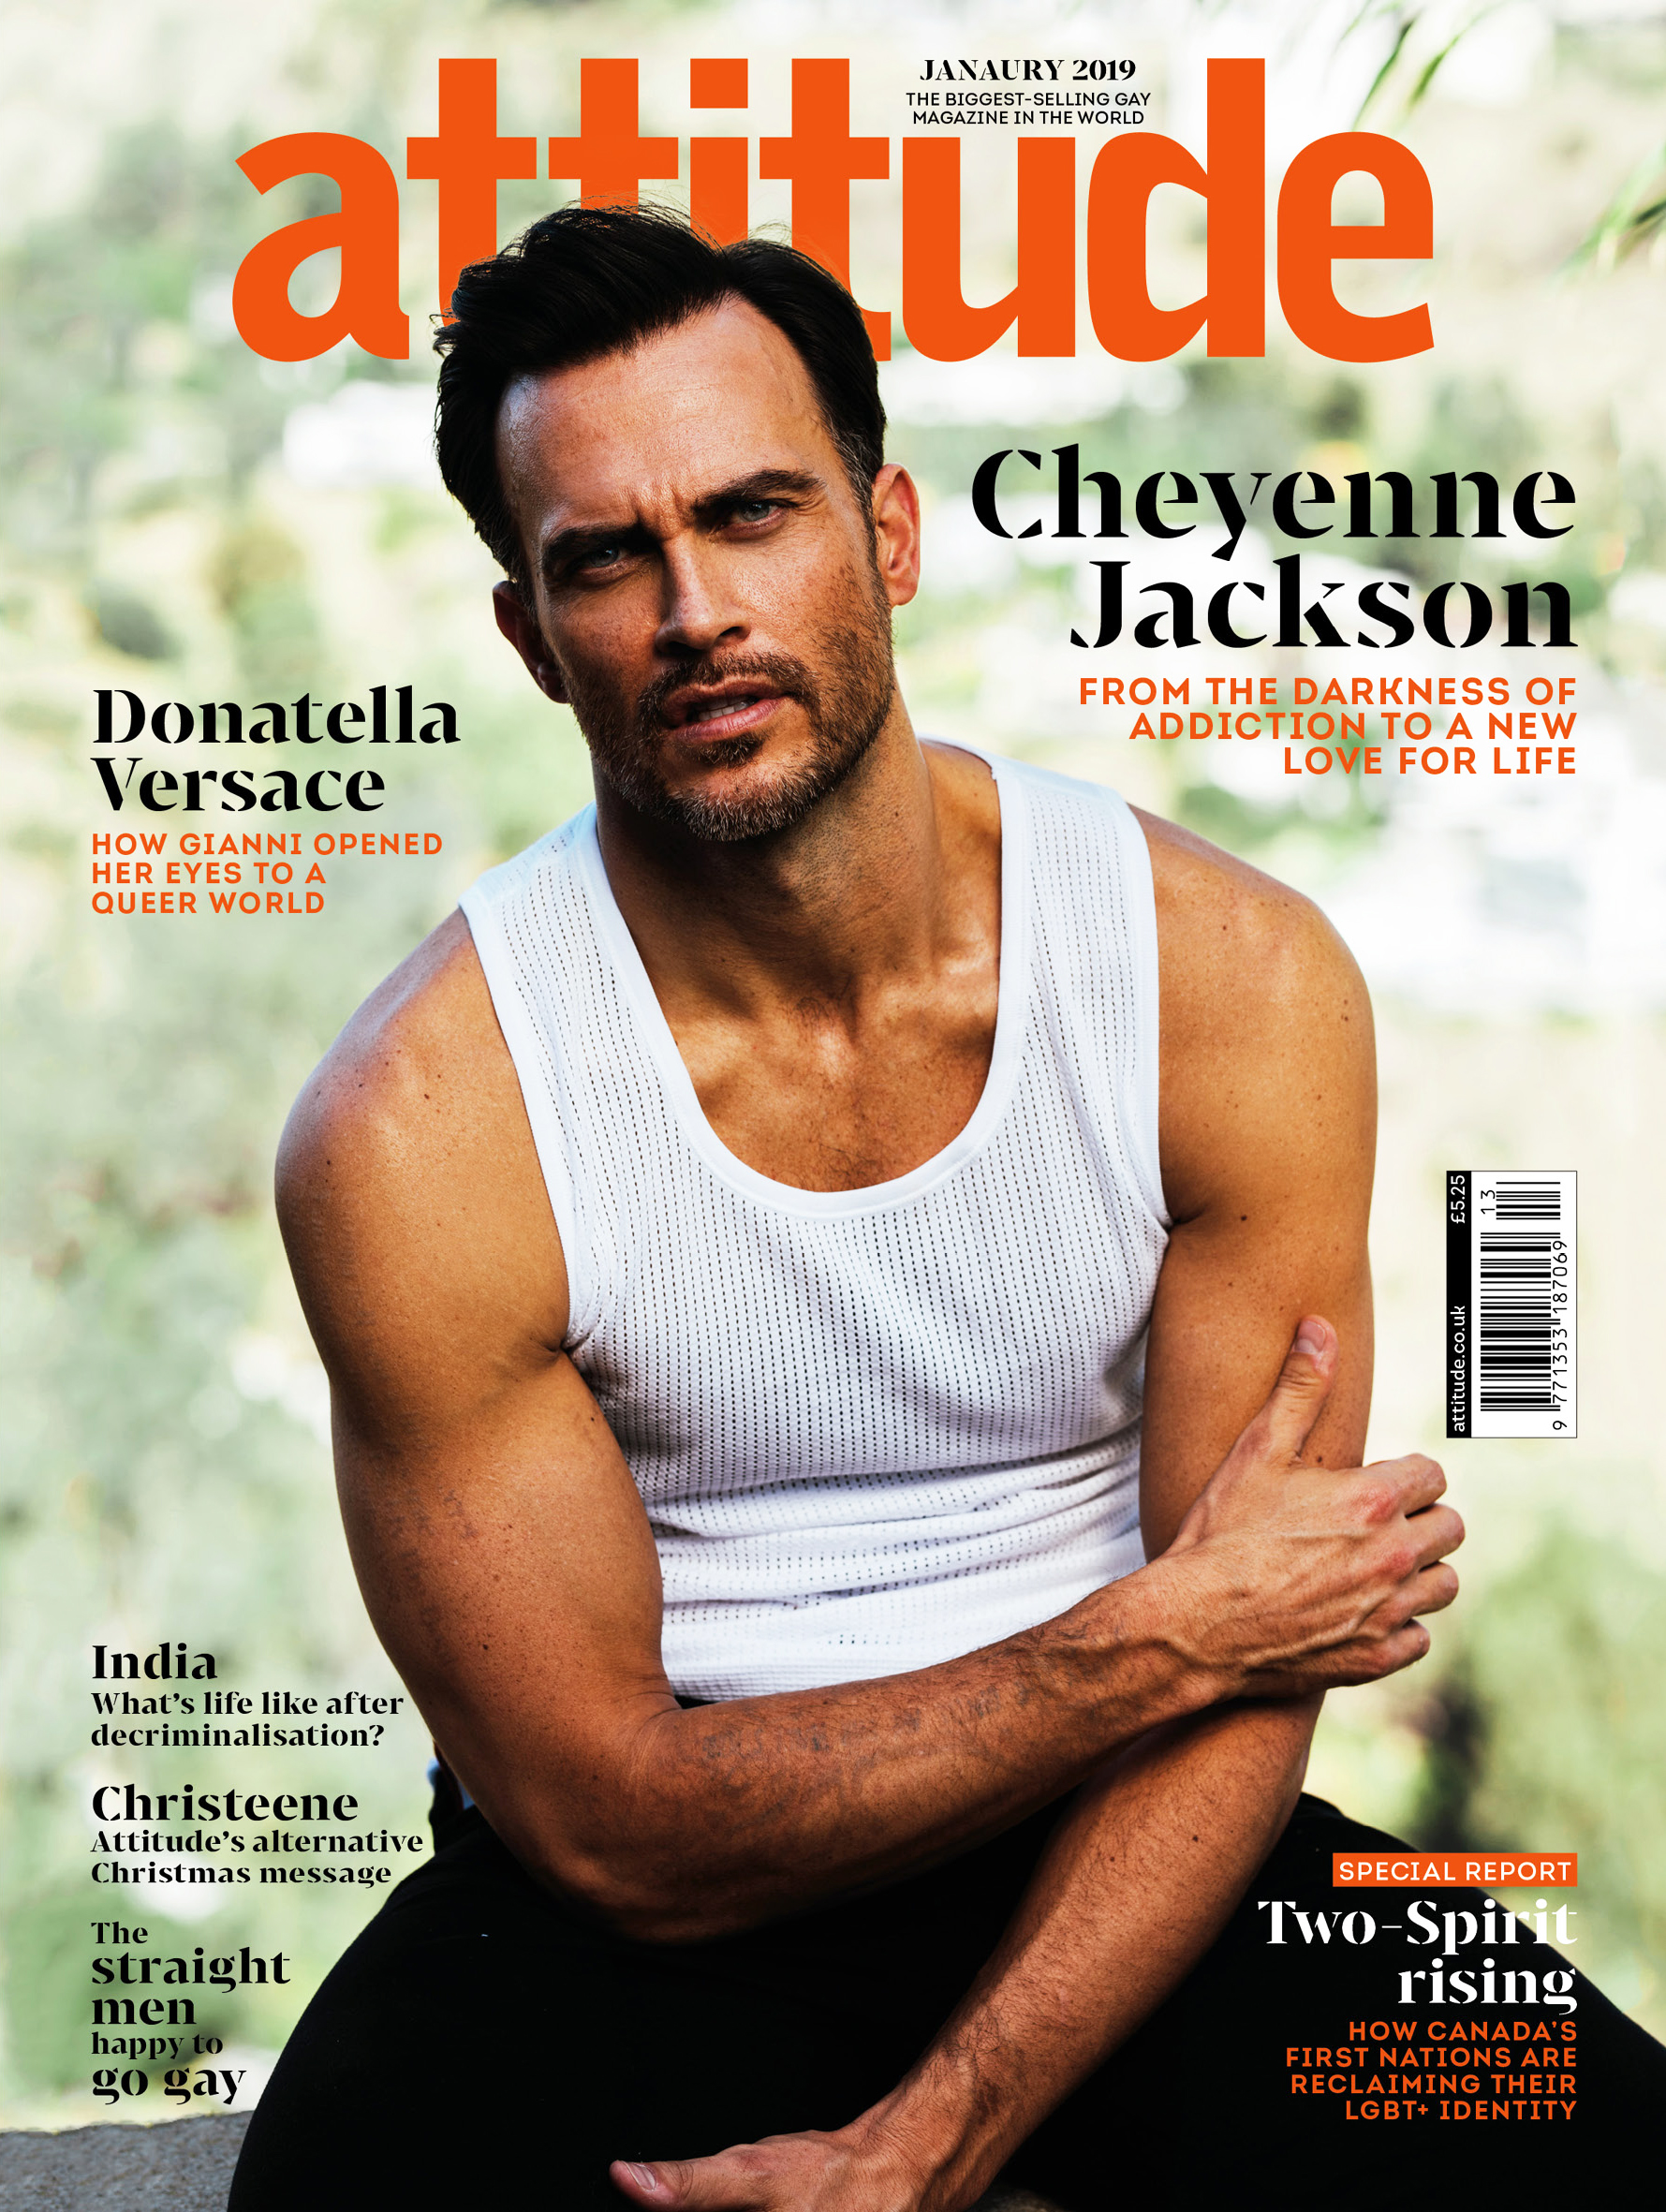 304 Cheyenne Jackson Square cover.jpg